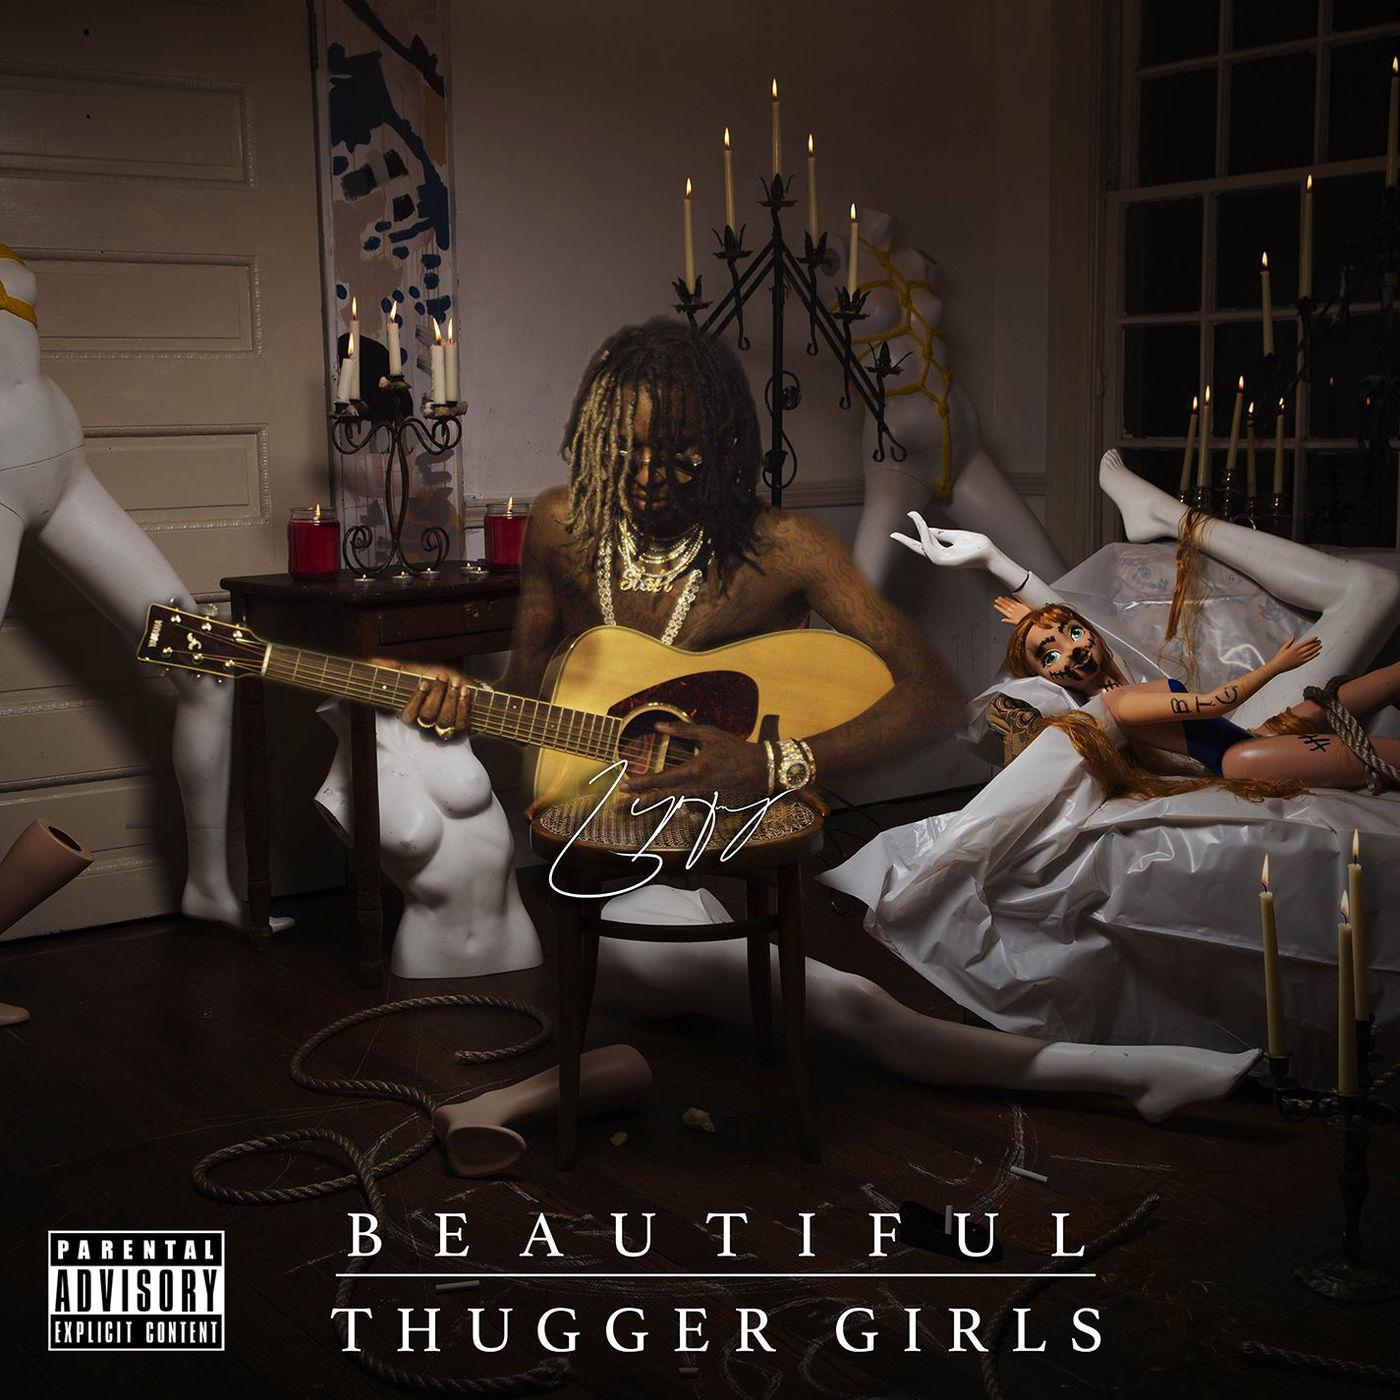 Young Thug - You Said (feat. Quavo) - Single Cover